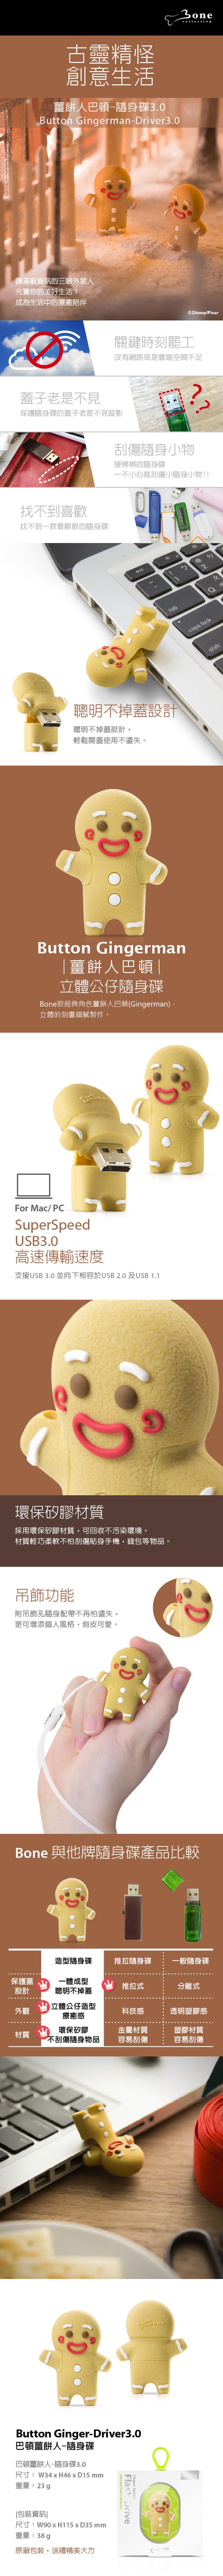 Bone 薑餅人 Button Gingerman Driver 3.0 隨身碟 - 32G